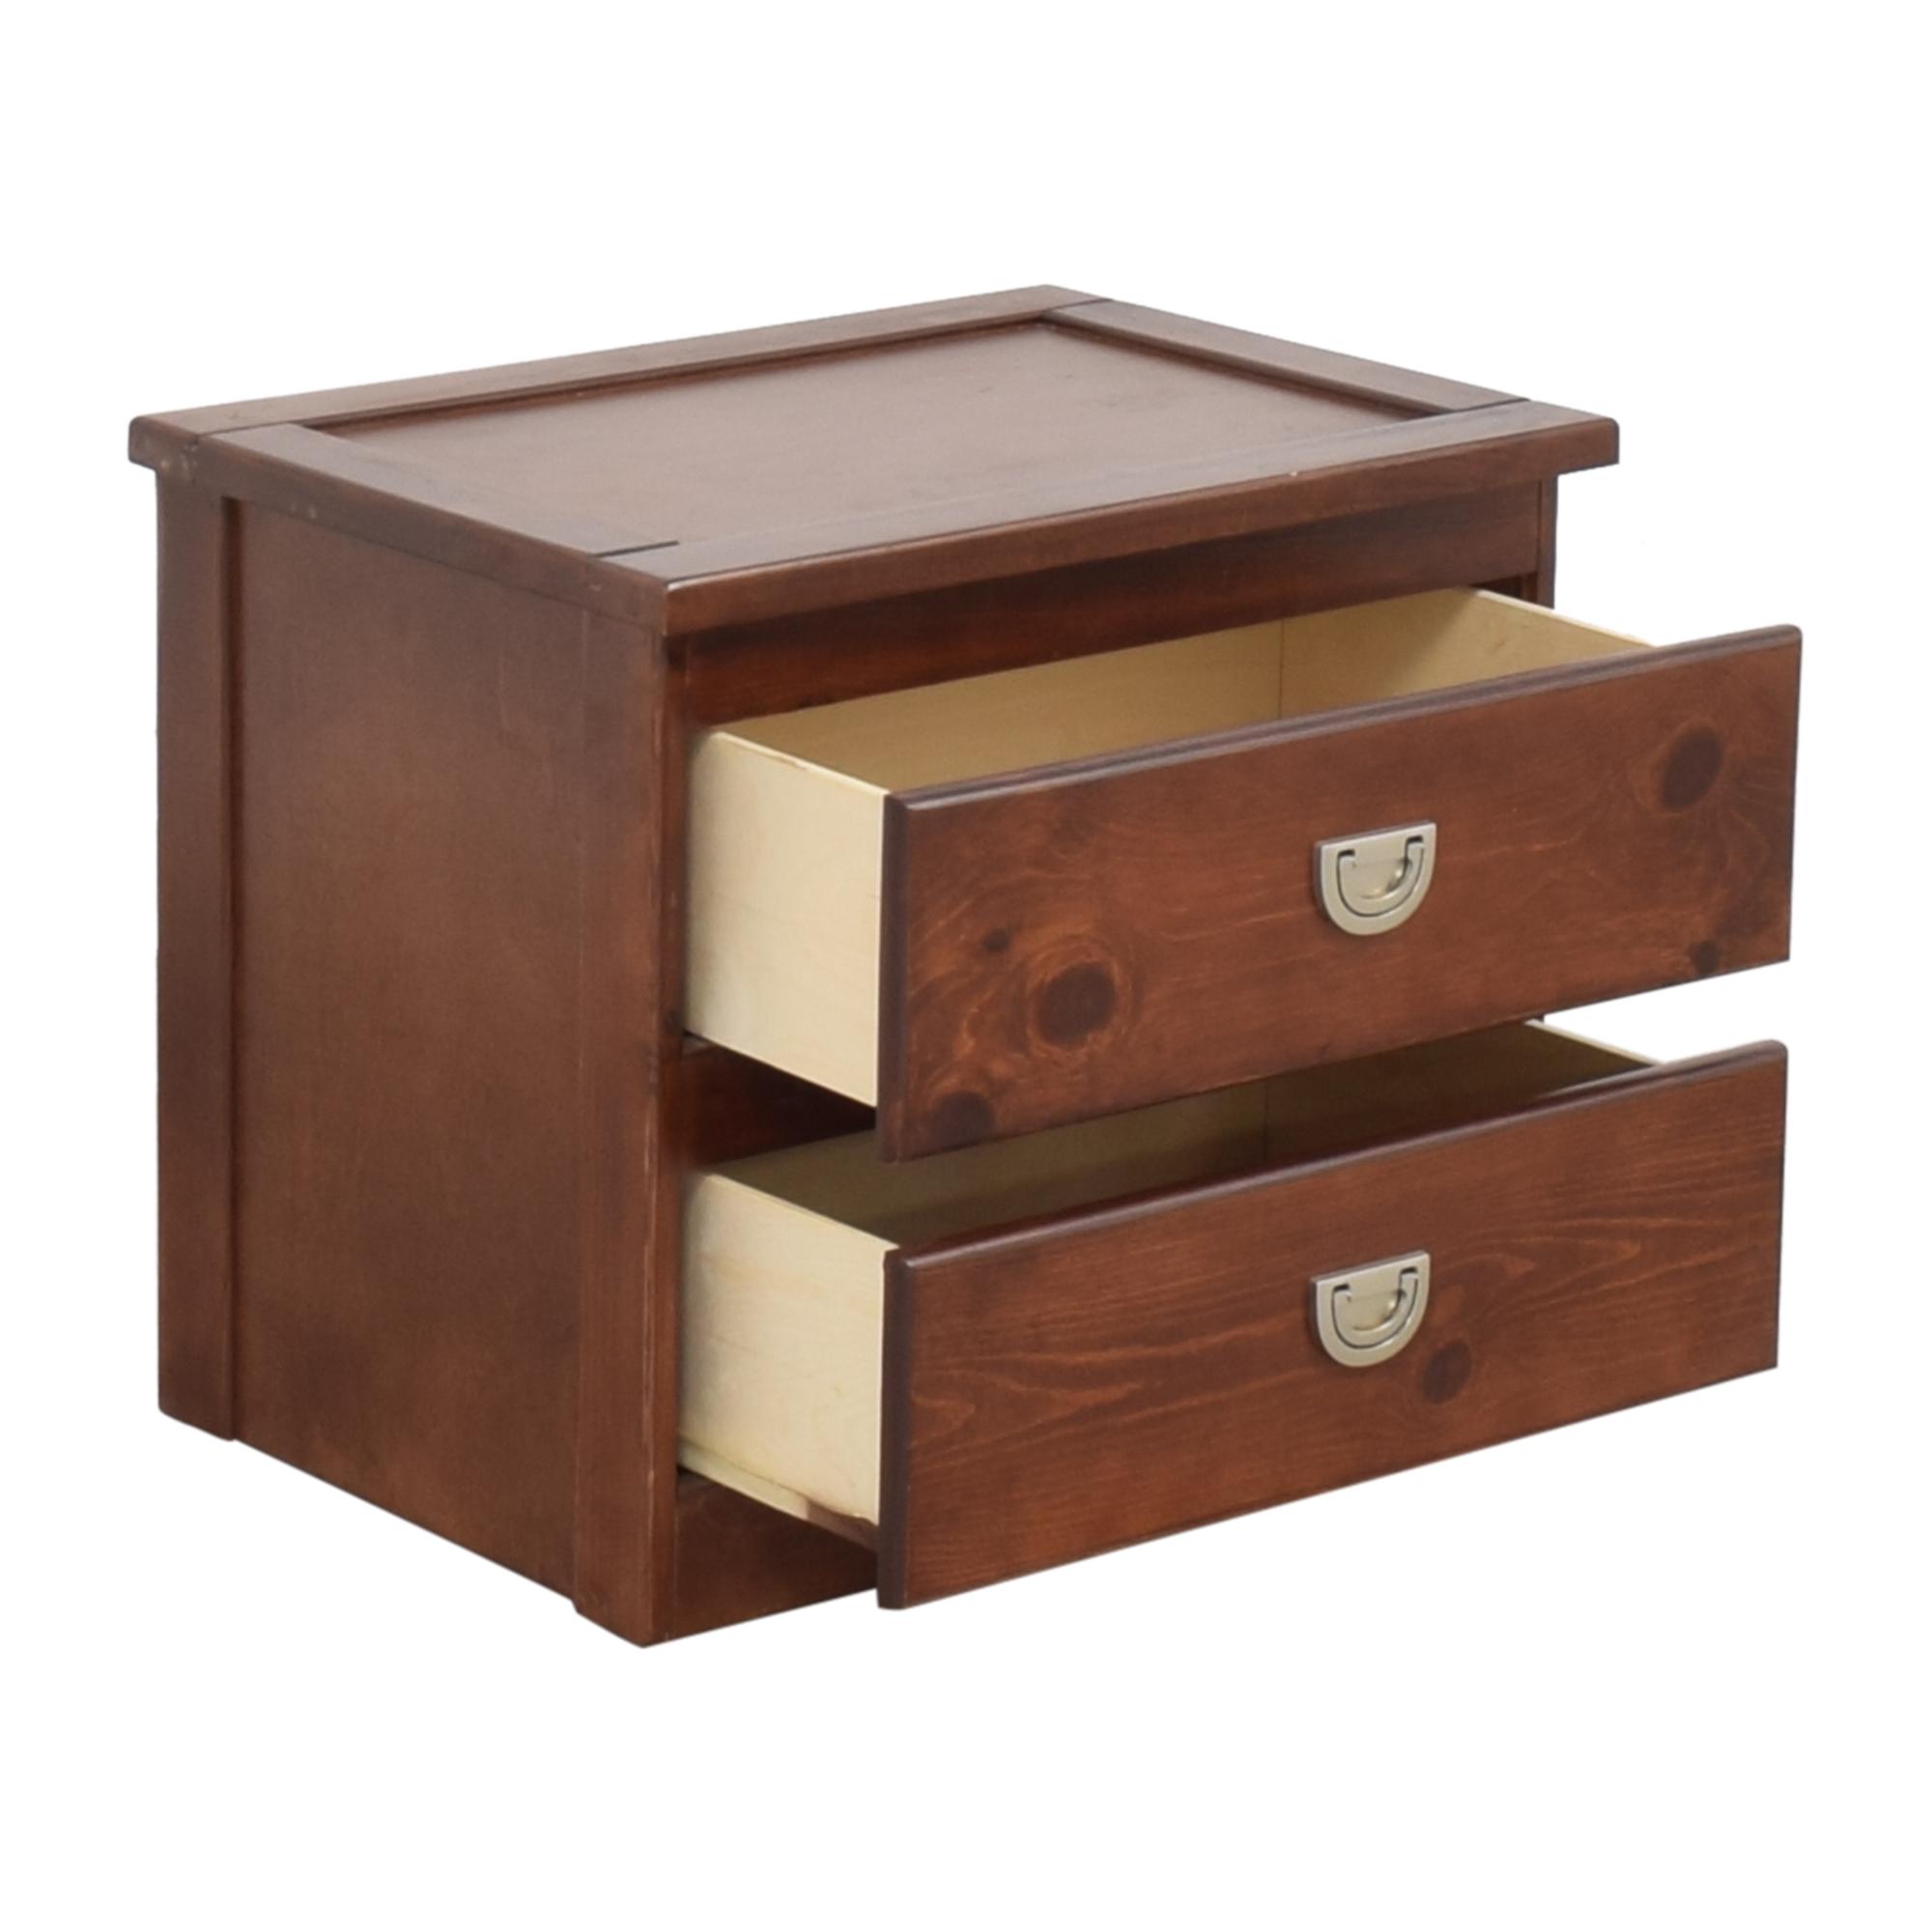 Raymour & Flanigan Oak Furniture West Tommi II Nightstand on sale